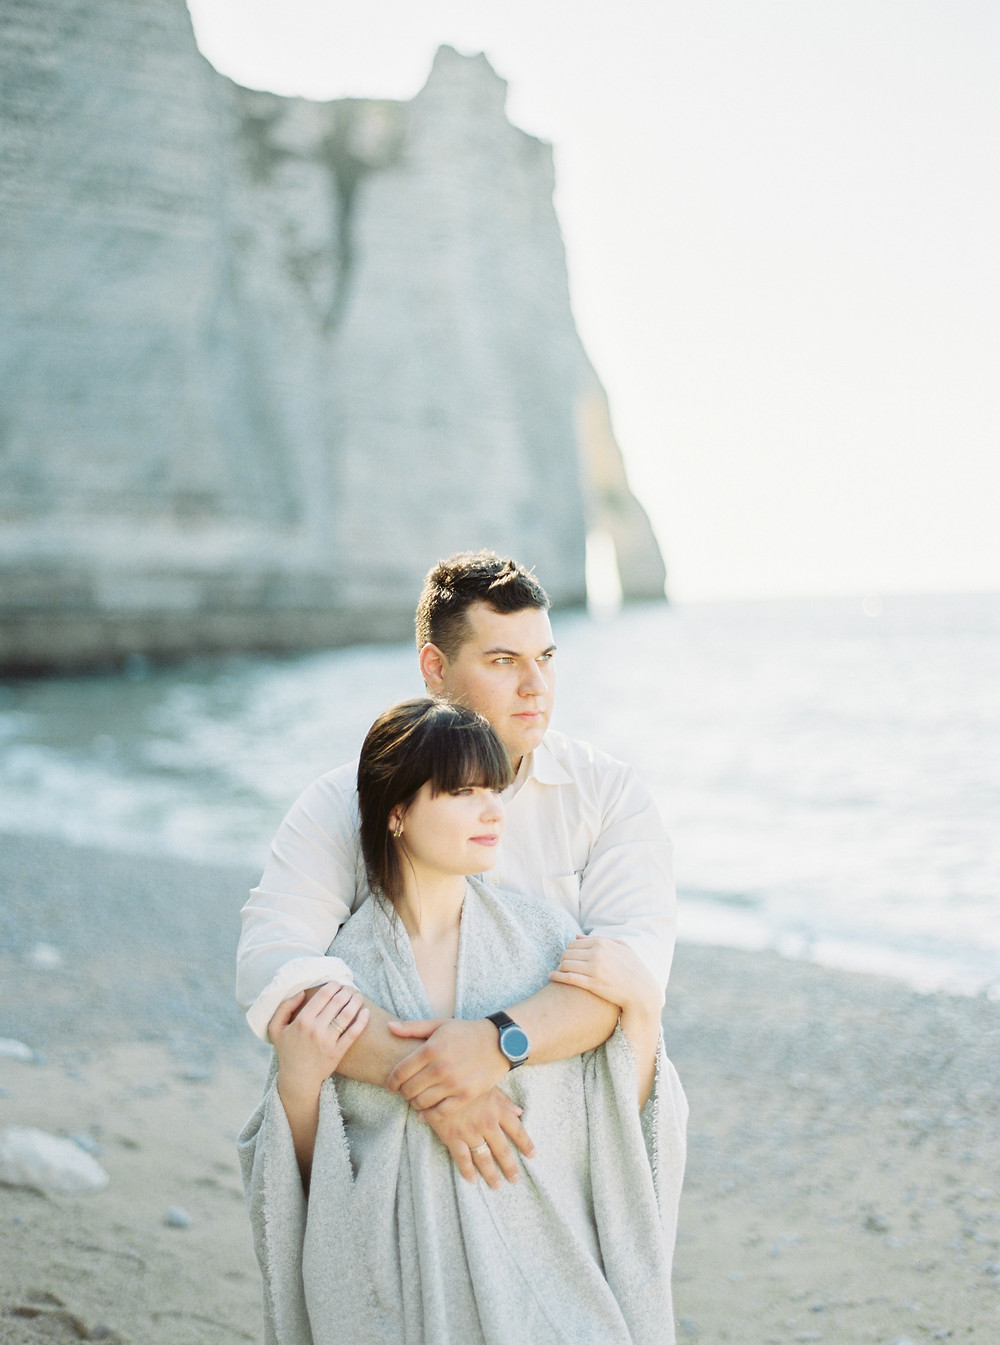 Fine art film wedding photographer in Etretat, France